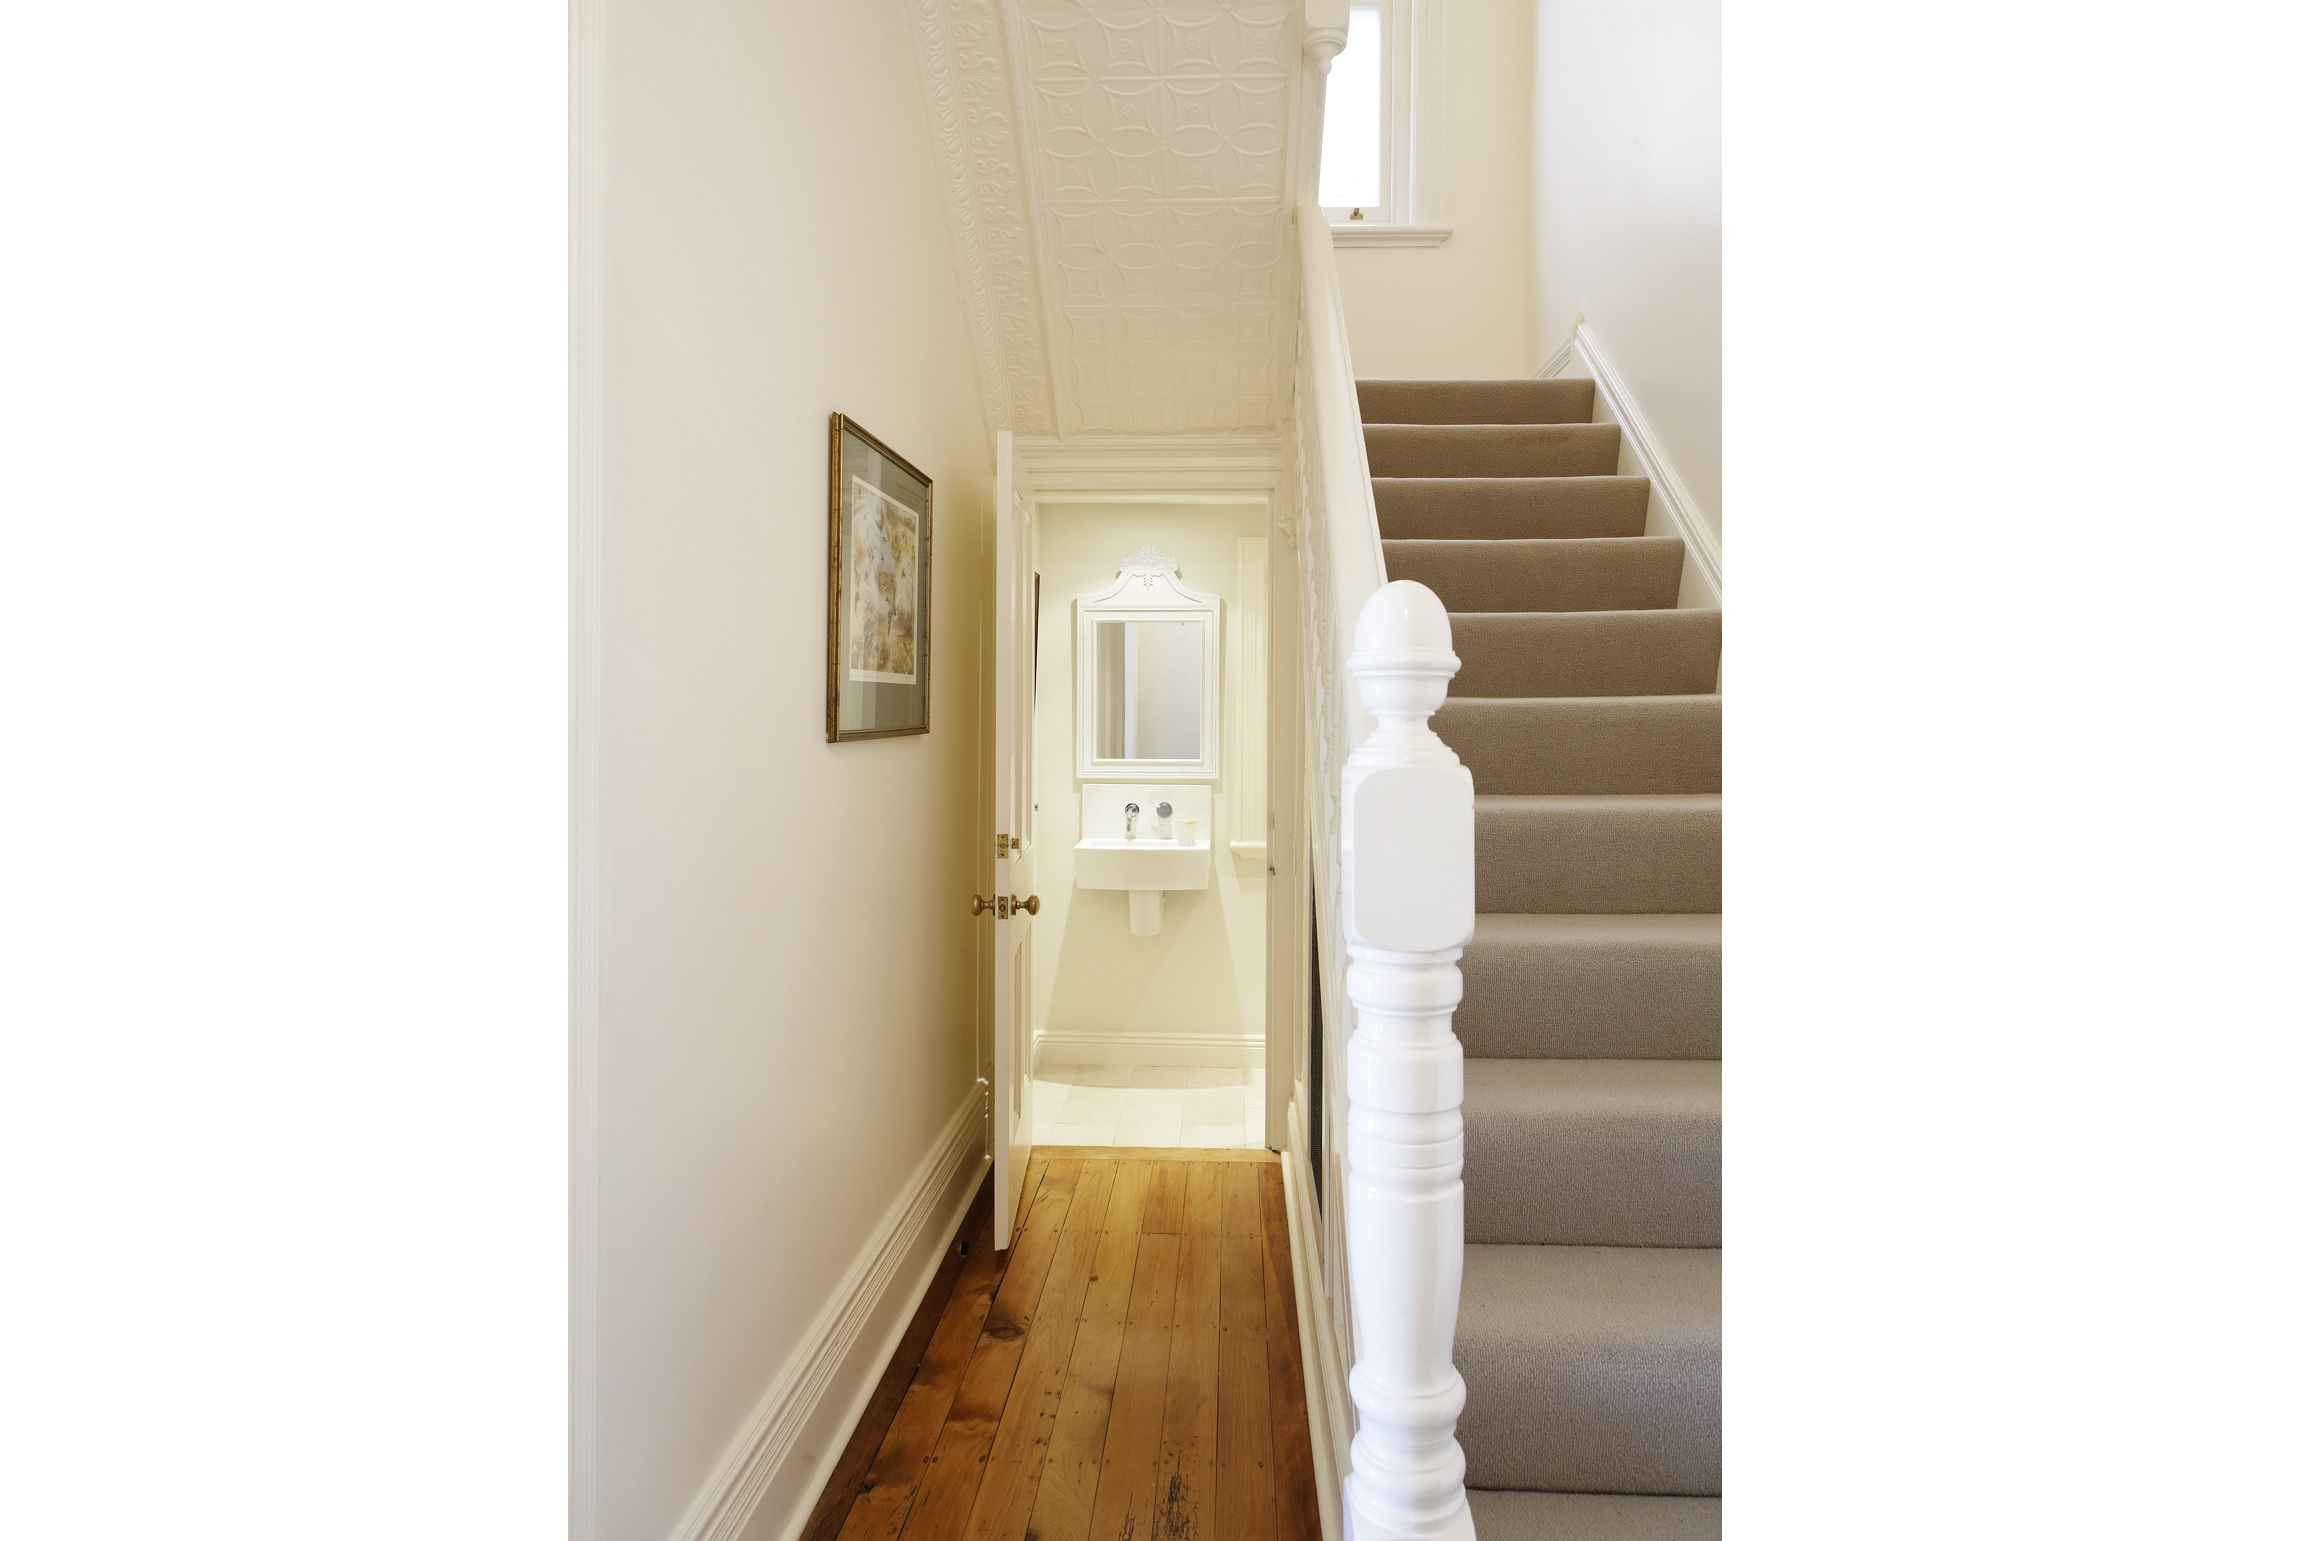 Interior-Design-Sydney-Stairway-Renovation-Michael-Bell-Architects